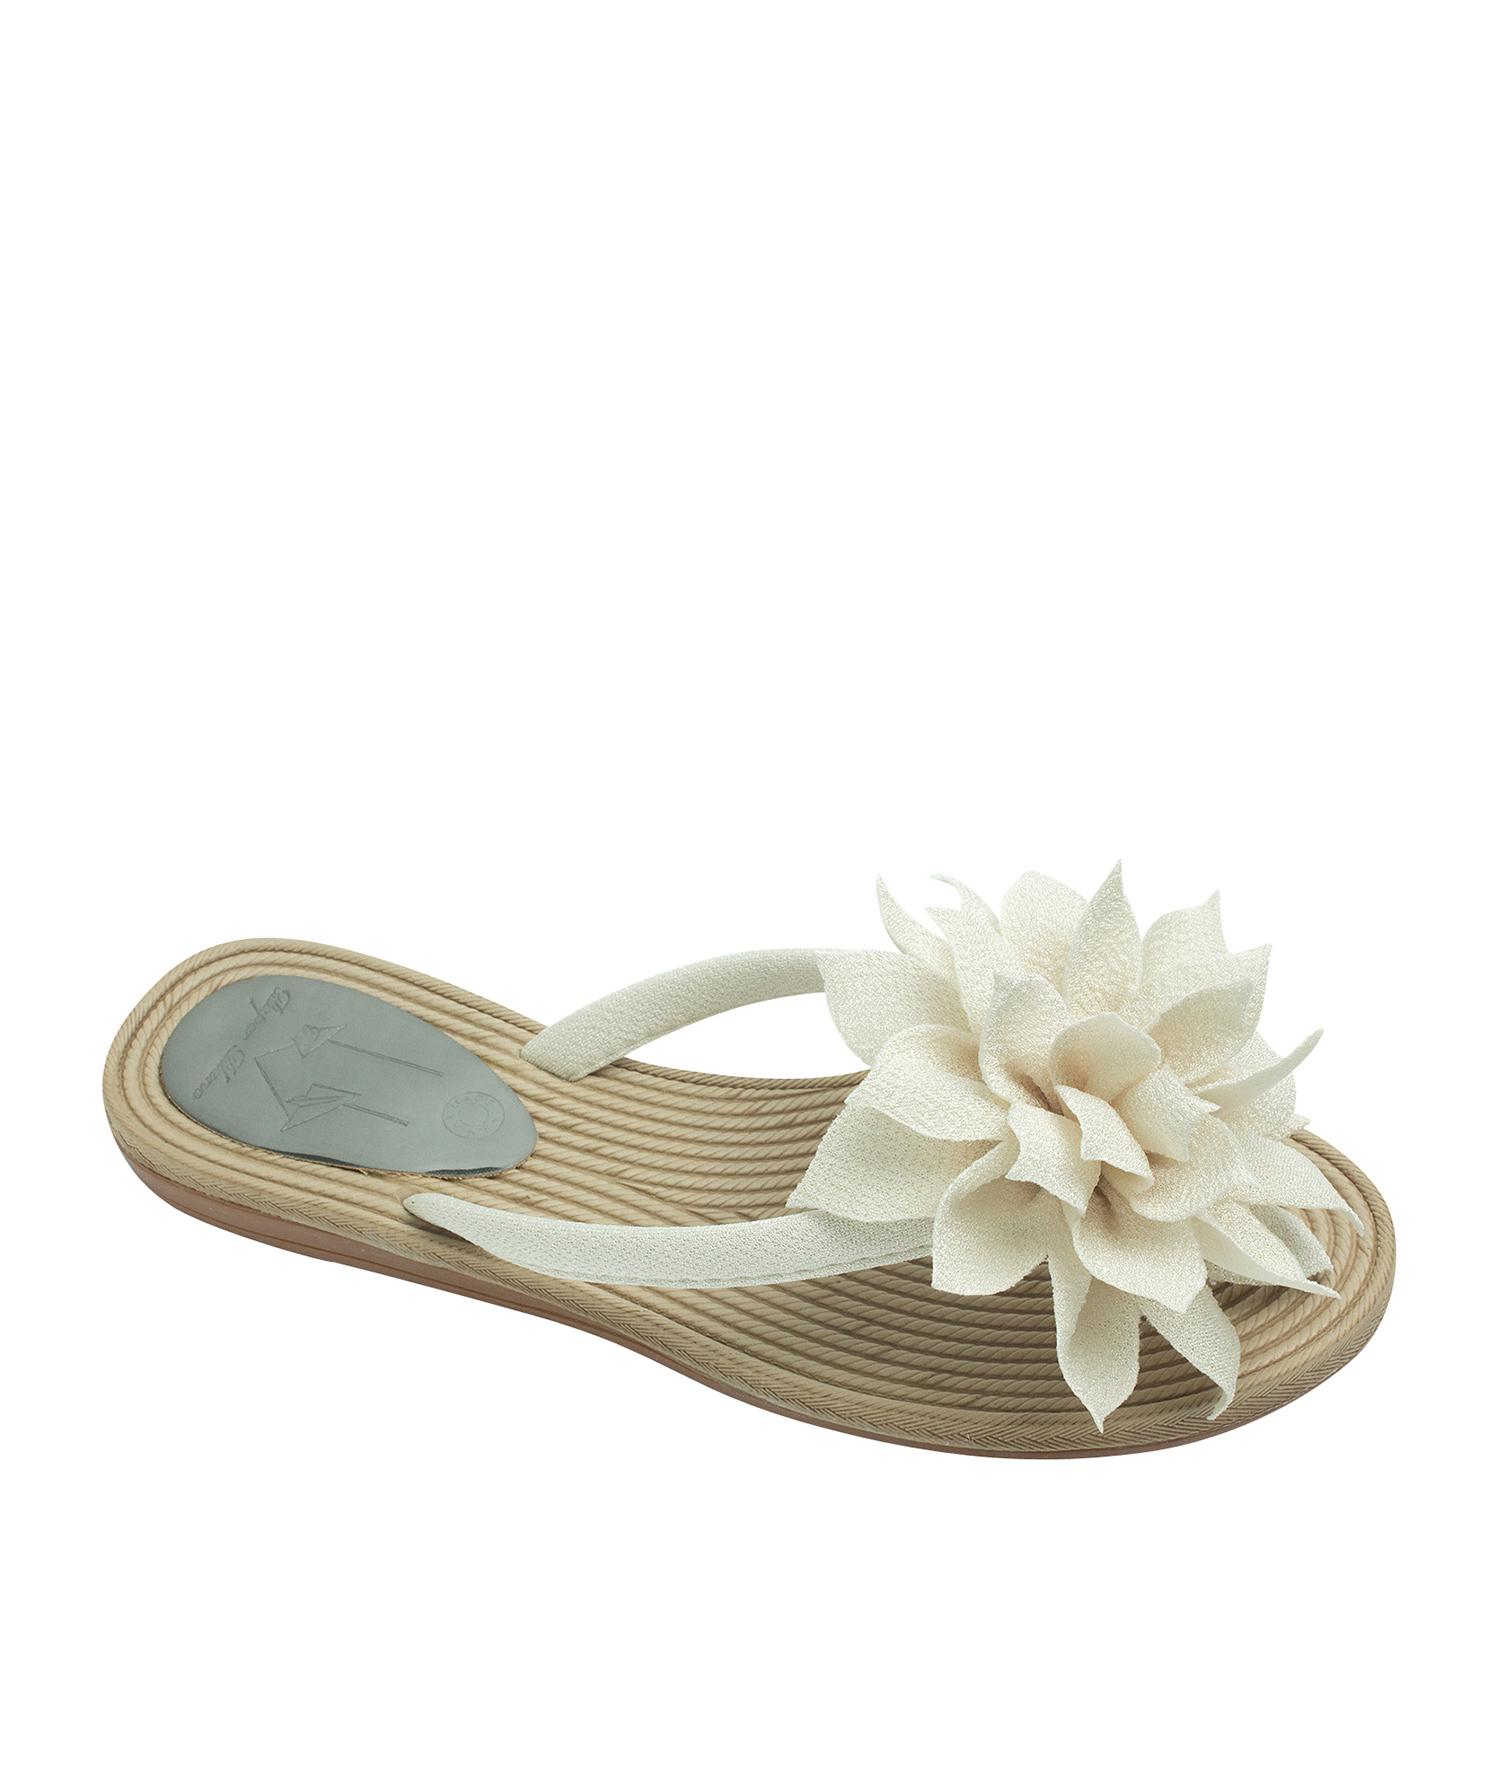 Farfetch Shoes Review